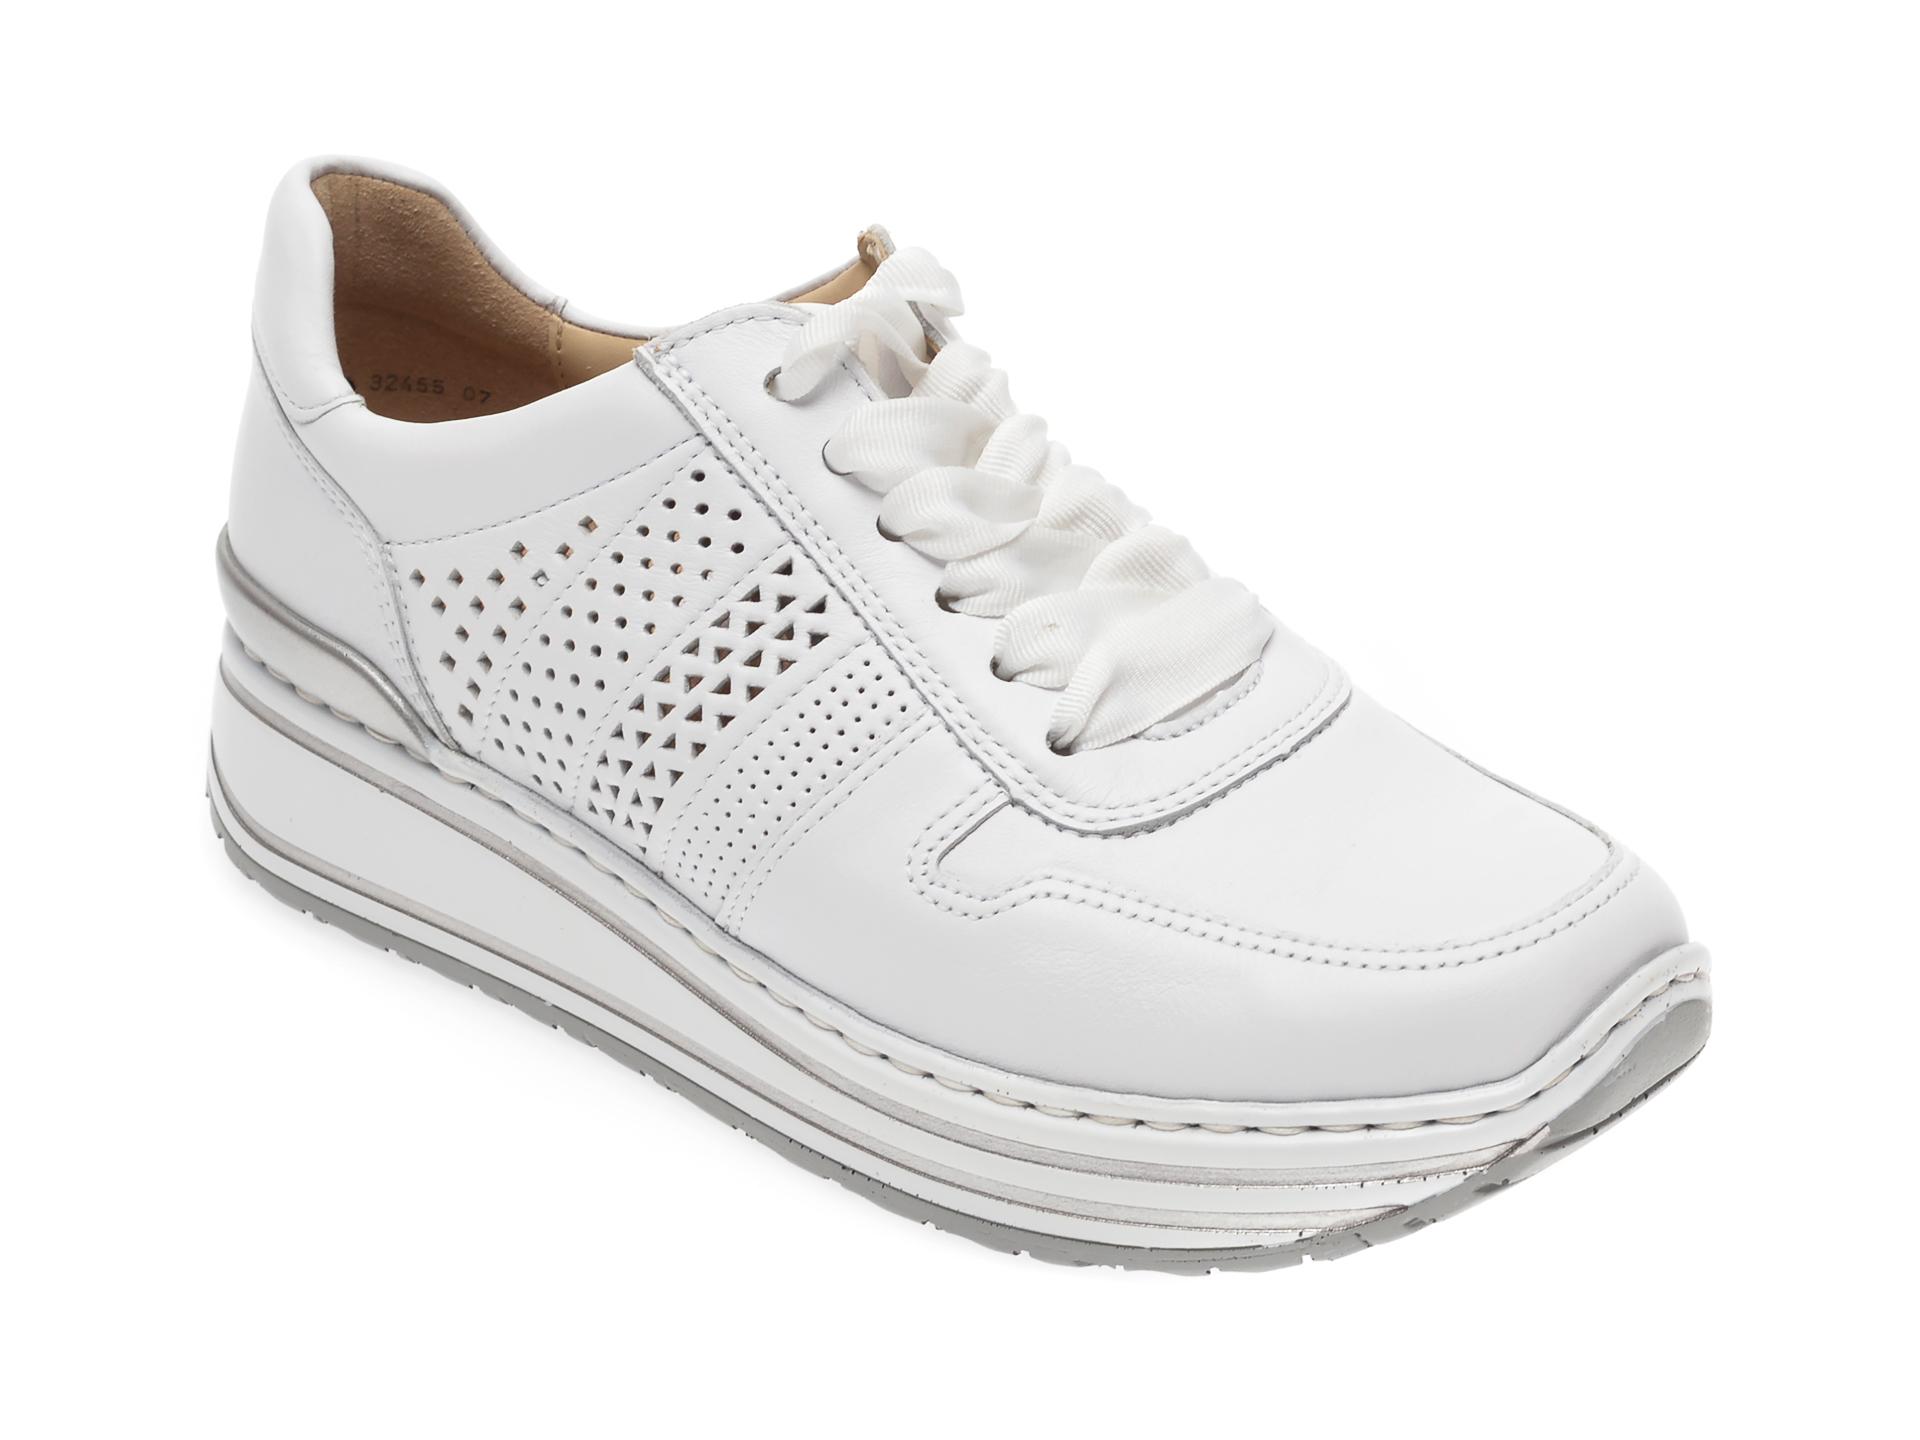 Pantofi sport ARA albi, 32465, din piele naturala imagine